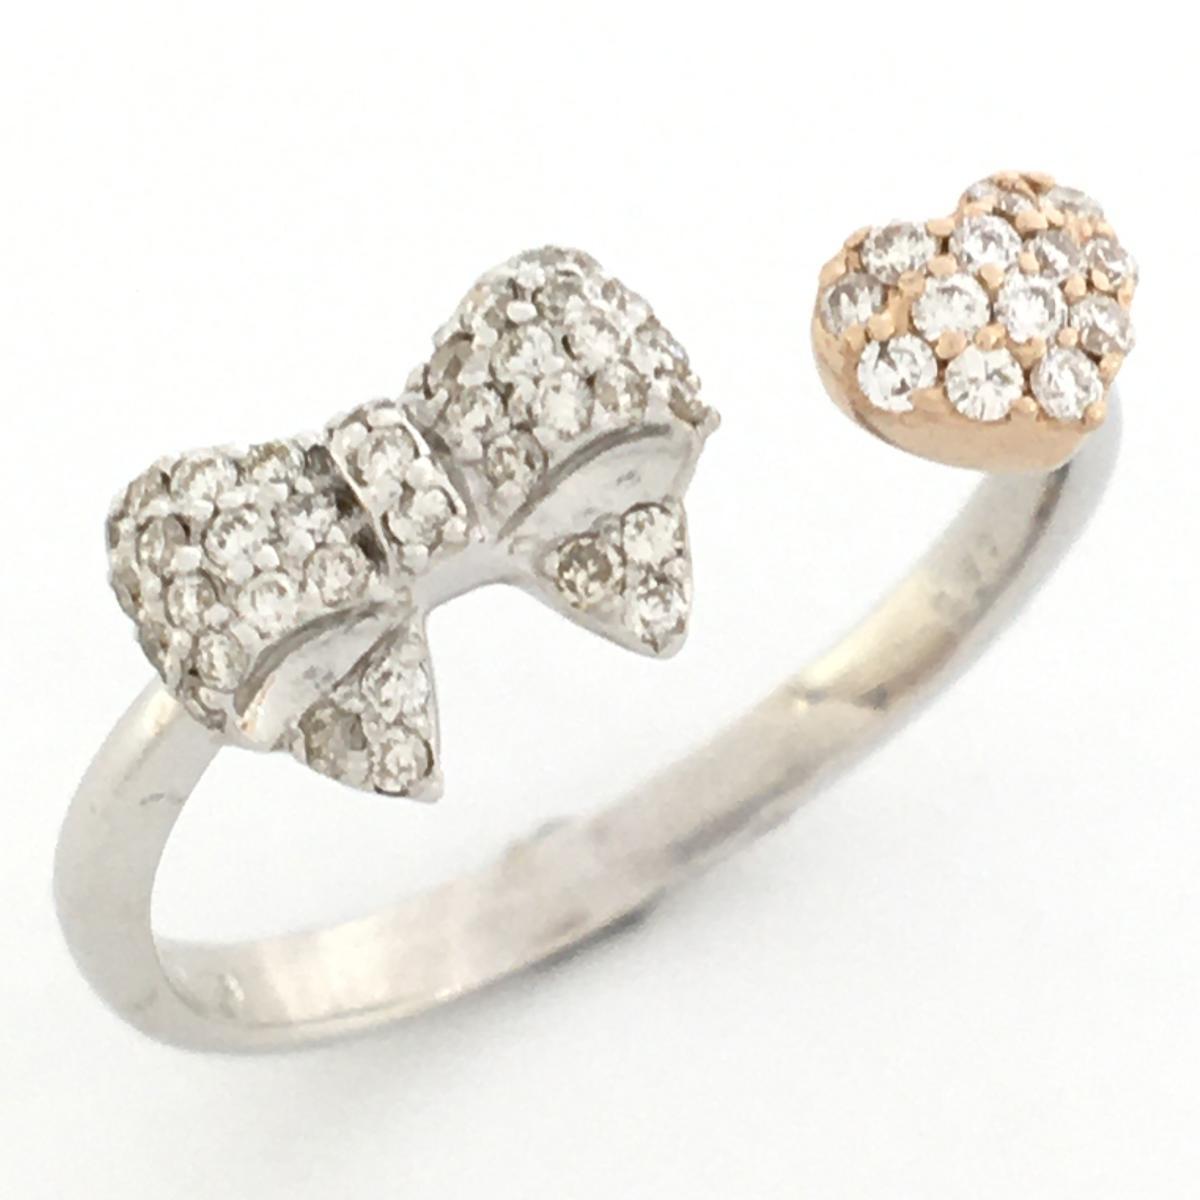 JEWELRY(ジュエリー)/ダイヤモンドリング 指輪 レディース/リング//K18WG(750)ホワイトゴールド×ダイヤモンド 0.30ct×K18PG/【ランクS】/13号【中古】